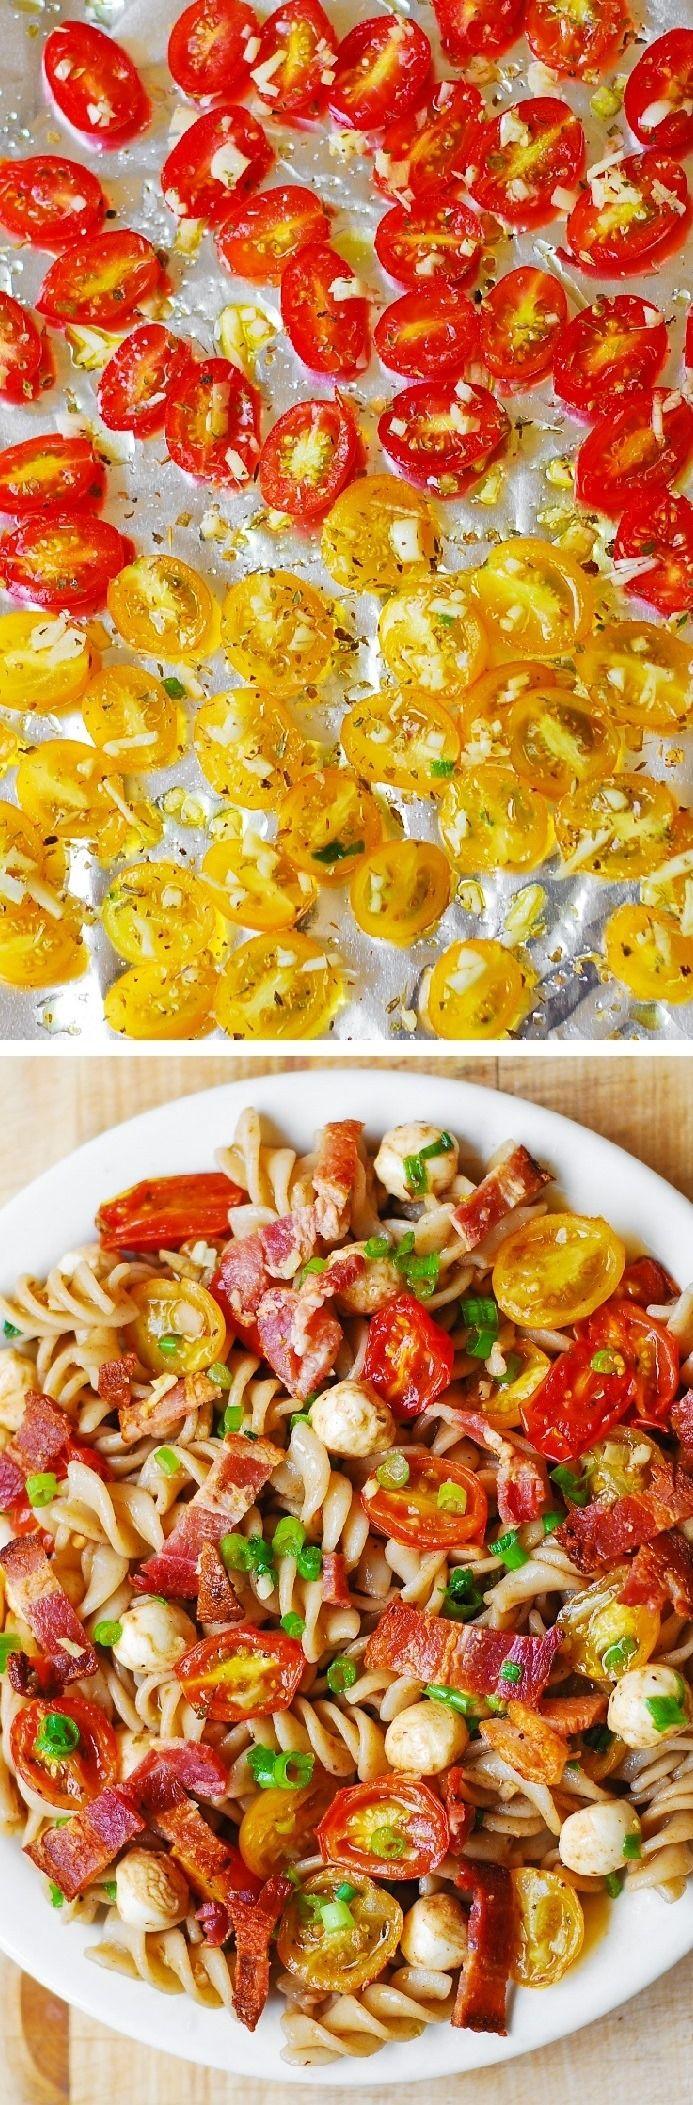 Pasta Salad with Bacon, Garlic Roasted Tomatoes and Mozzarella – delicious, healthy recipe!